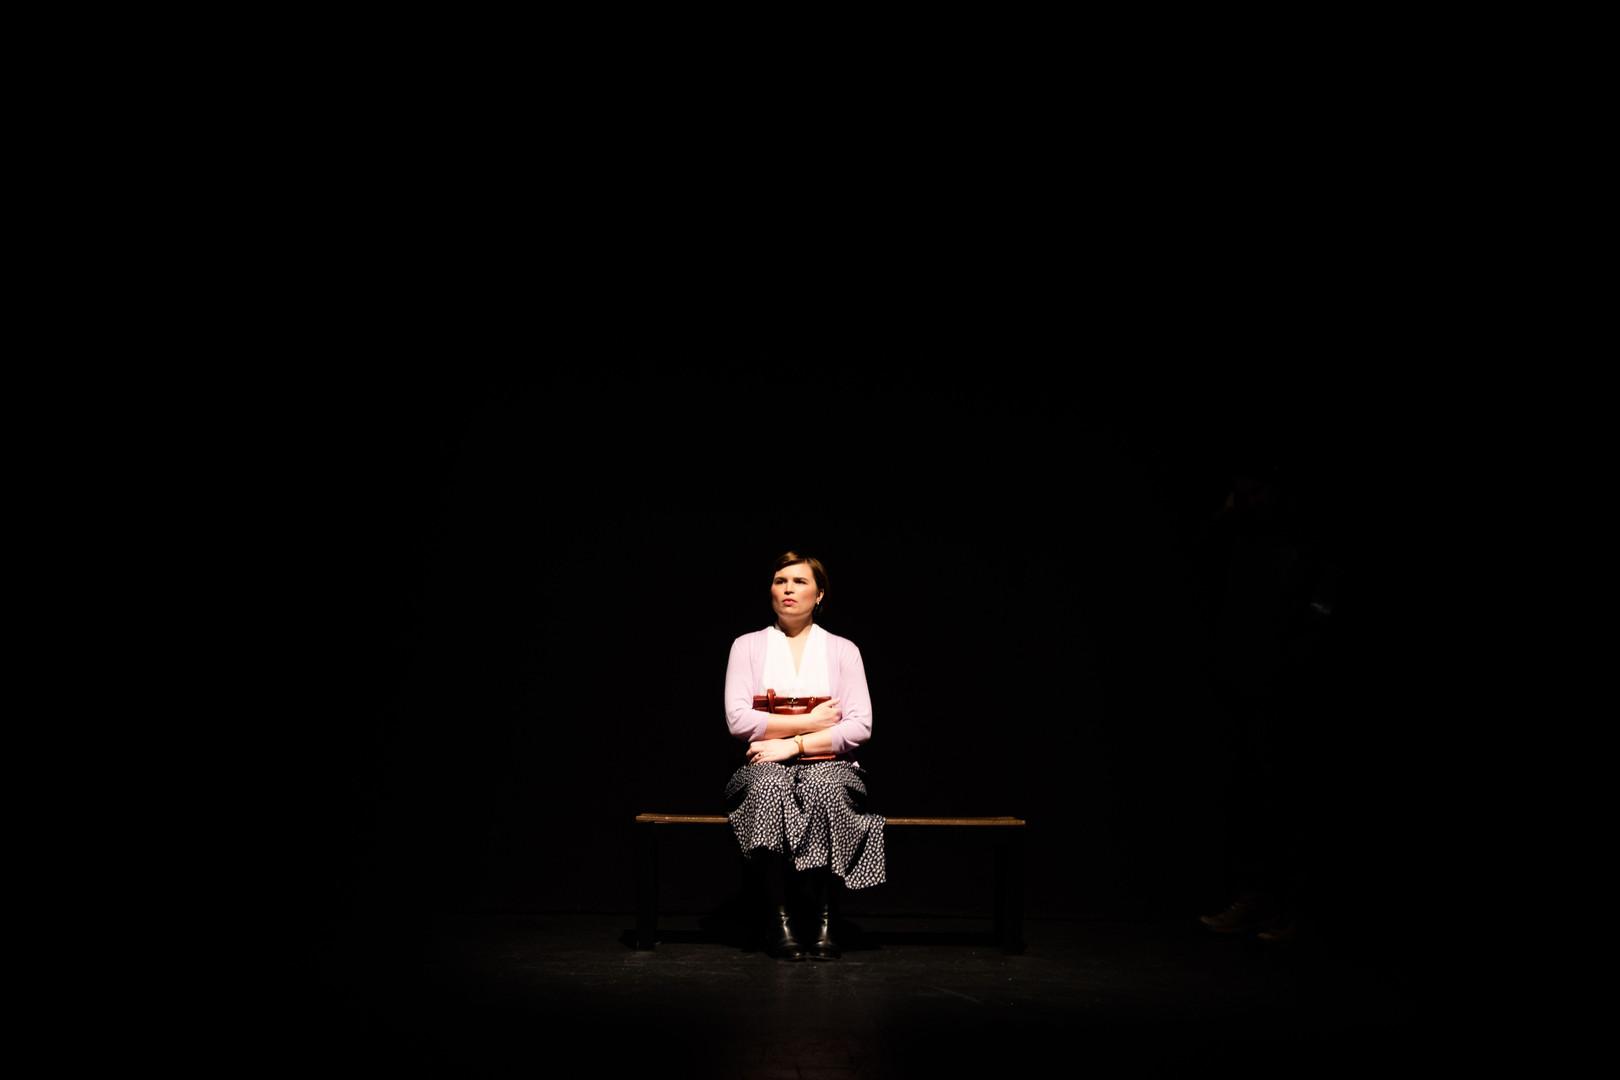 Savannah Lloyd as Doreen in Tell Me You Miss Me (2020) / Carrington Spires Photography